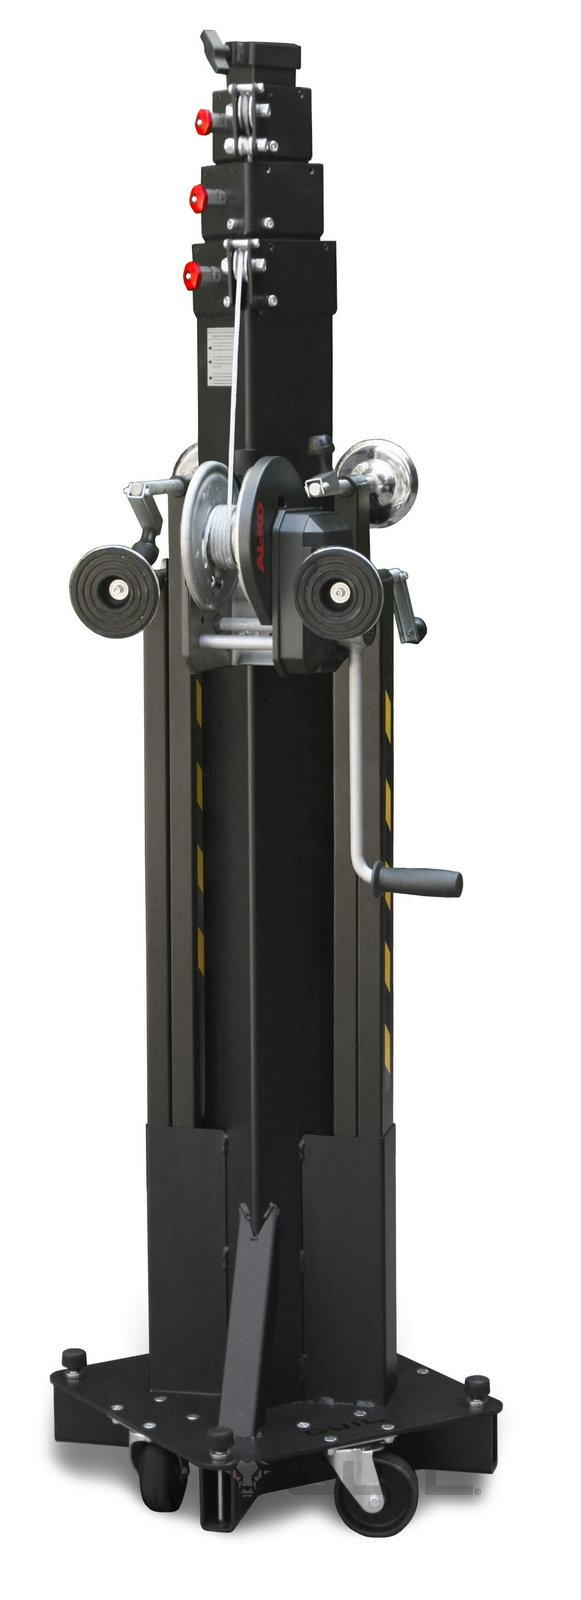 Materiaallift 1,8-5,2 m 280 kg (dutch) (2)